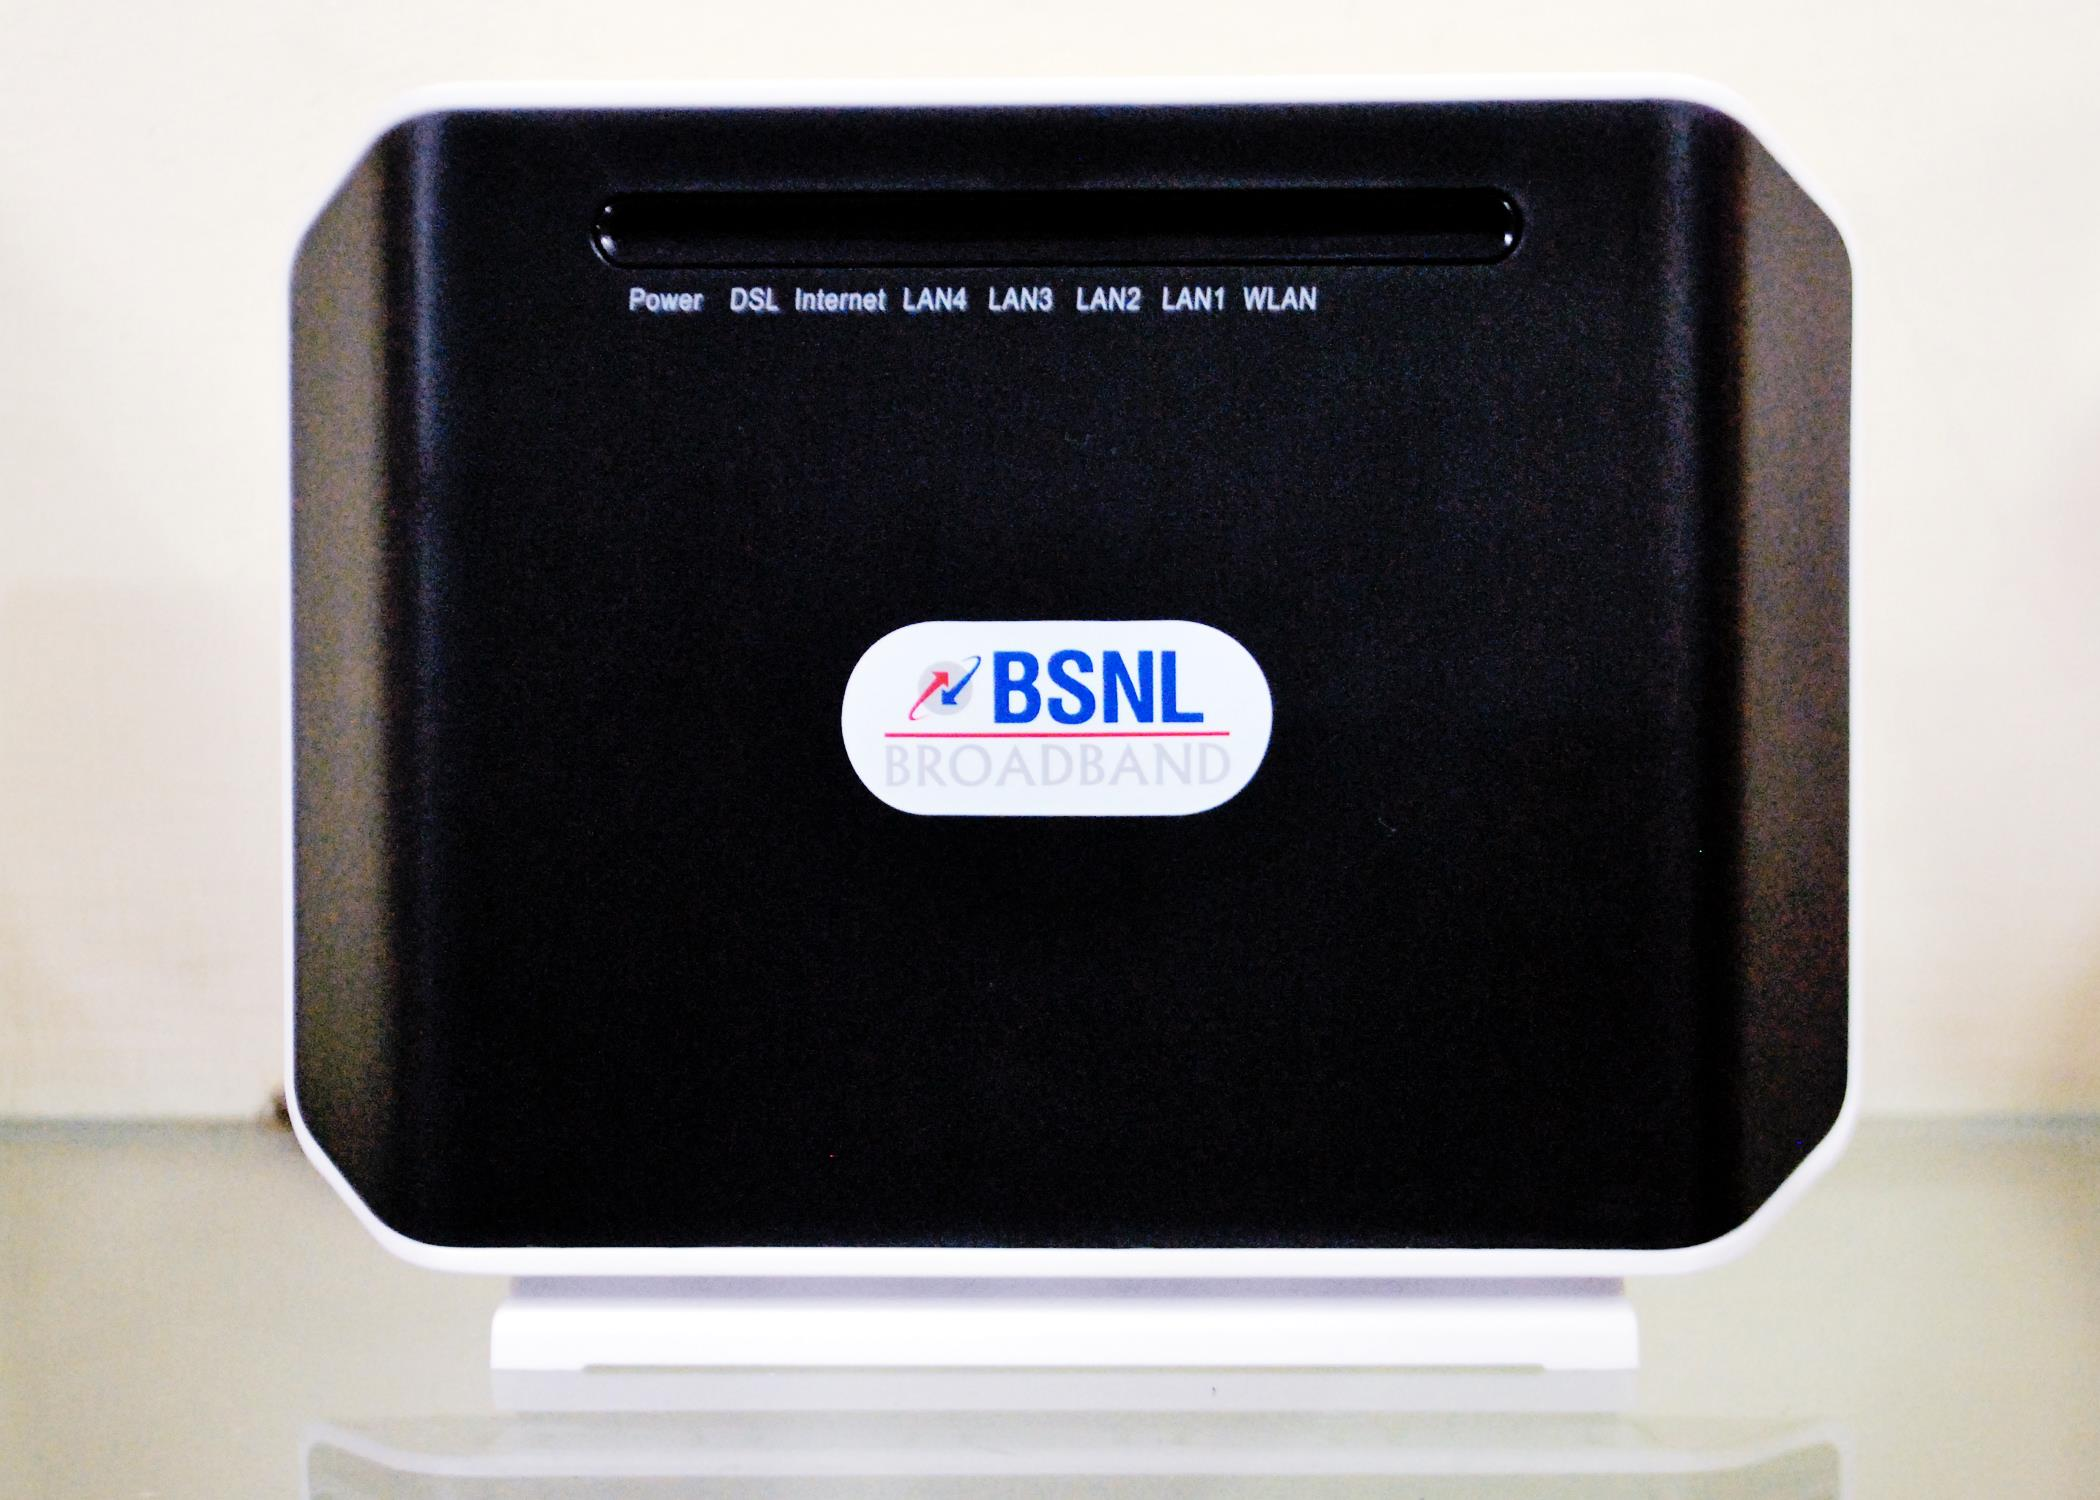 Teracom TDSL300W2 ADSL2+ Modem Image